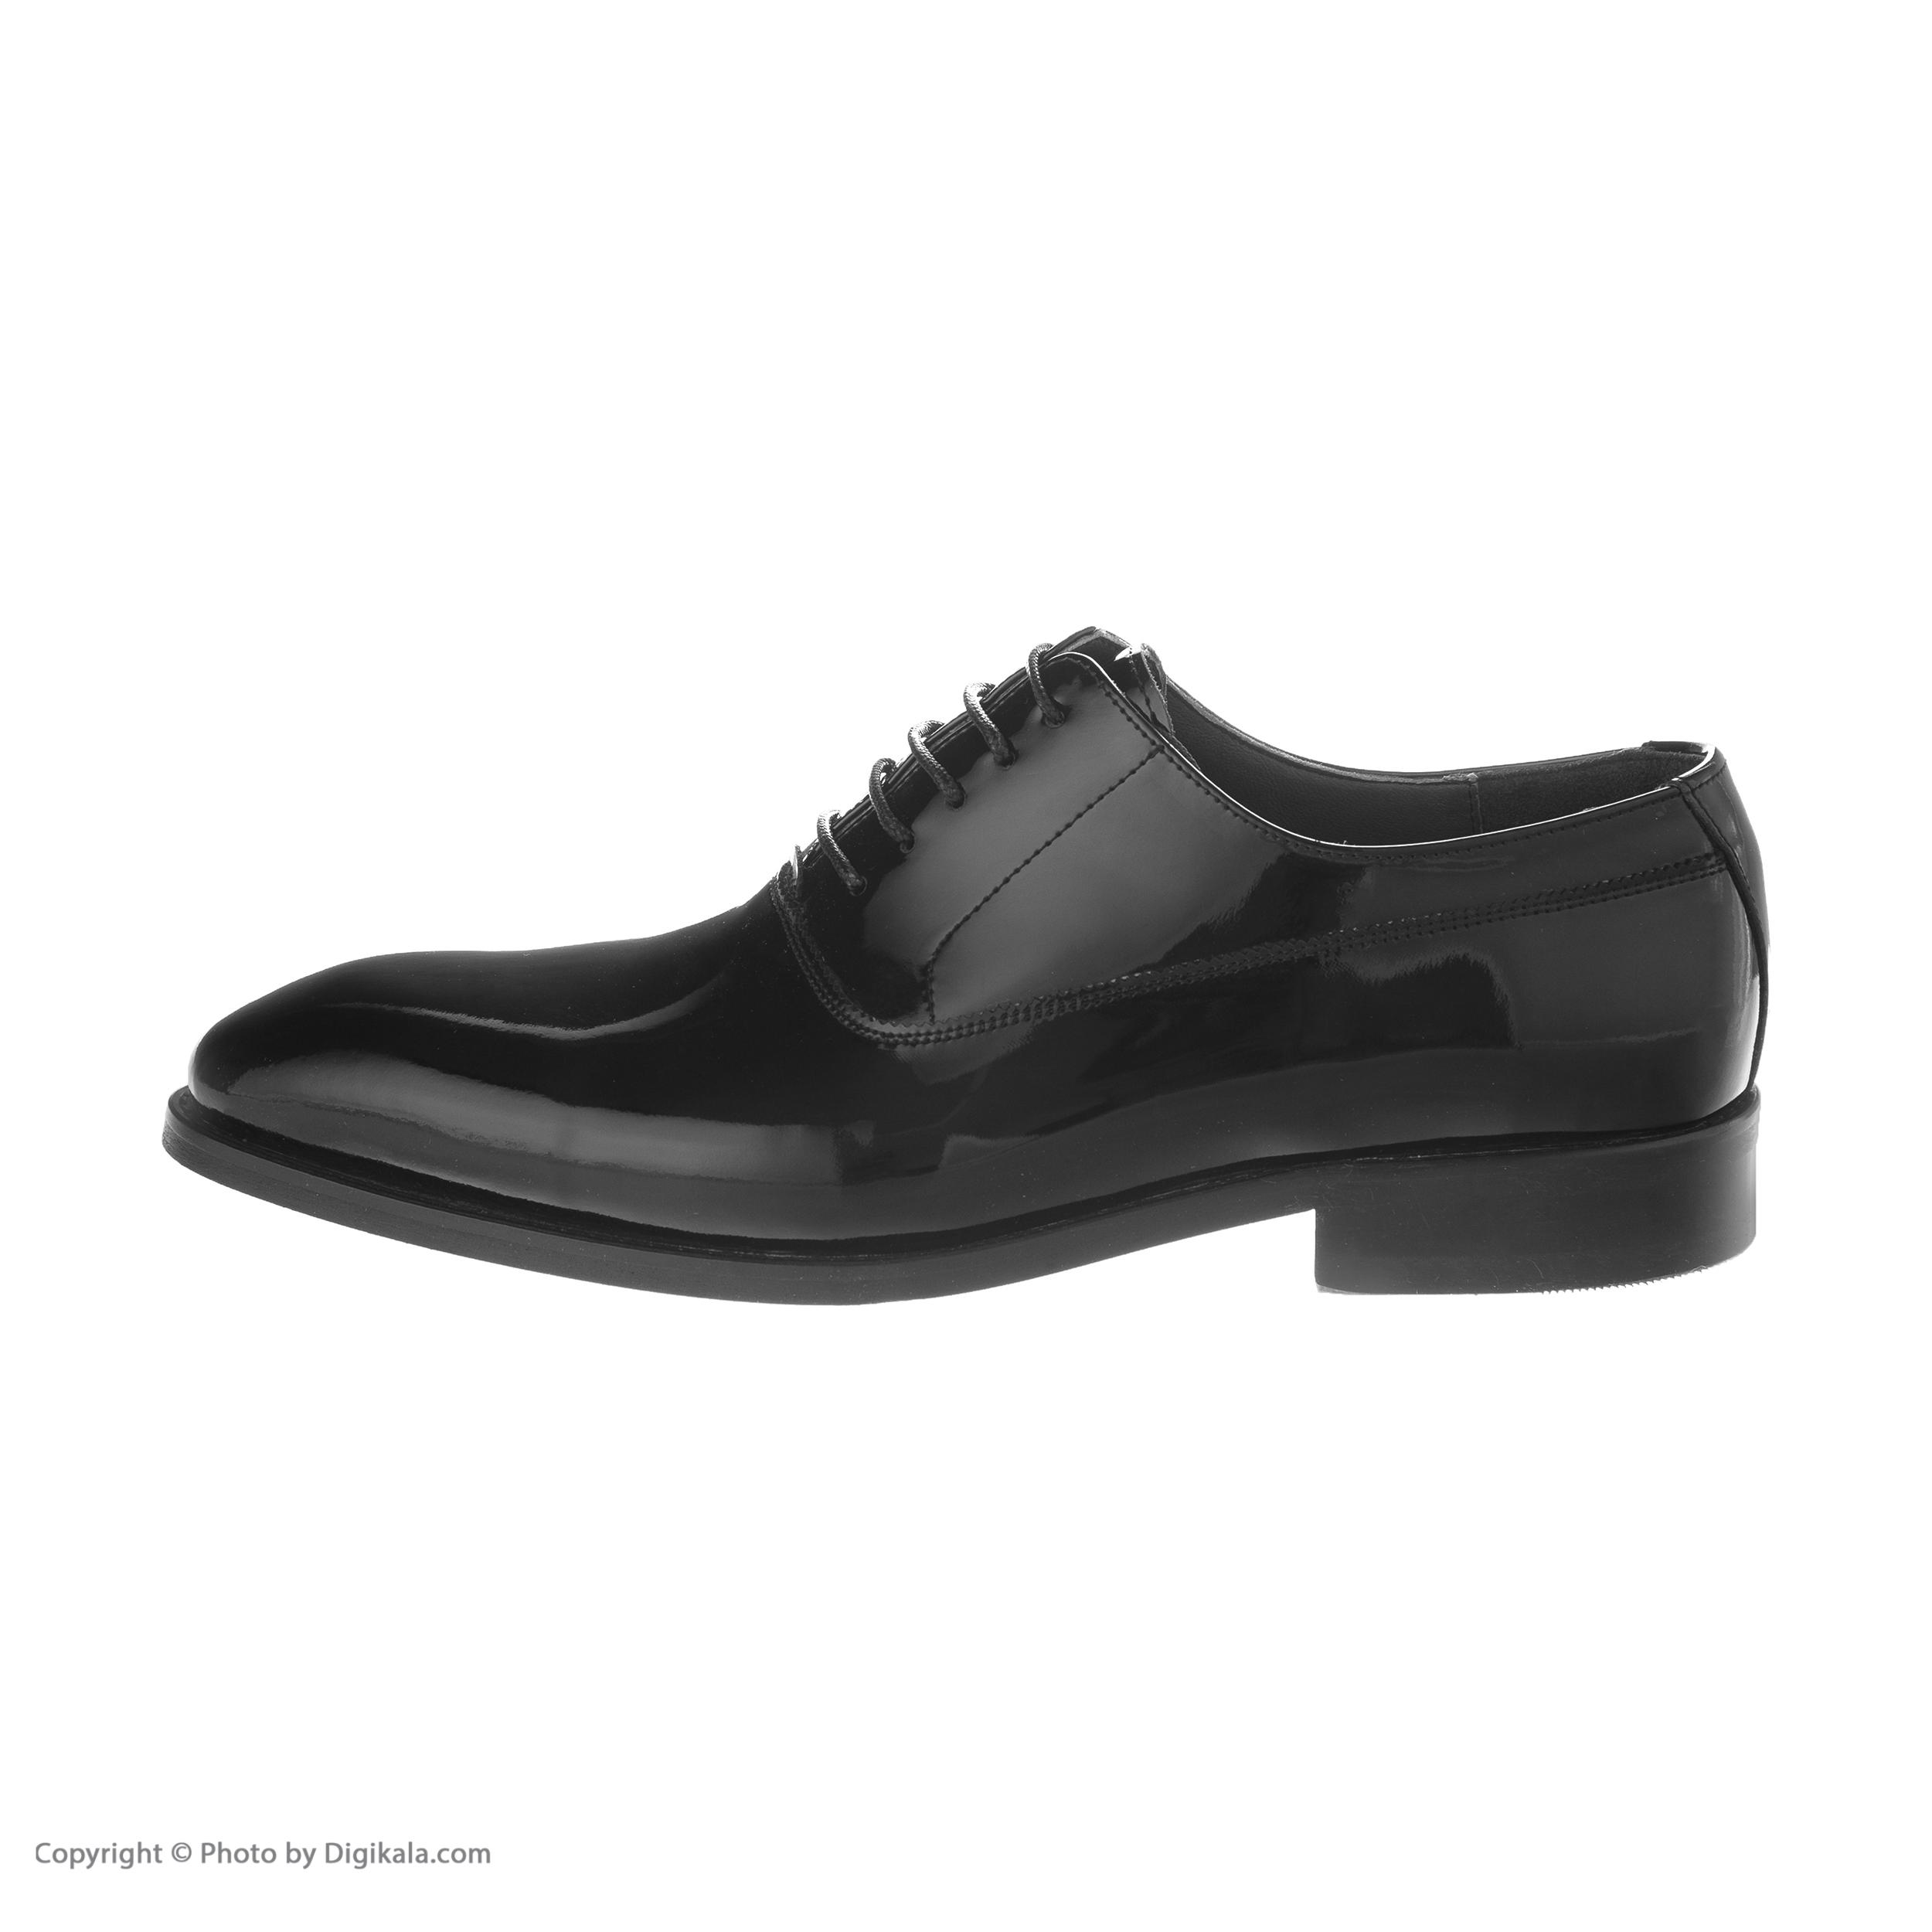 کفش مردانه آرتمن مدل august-41113